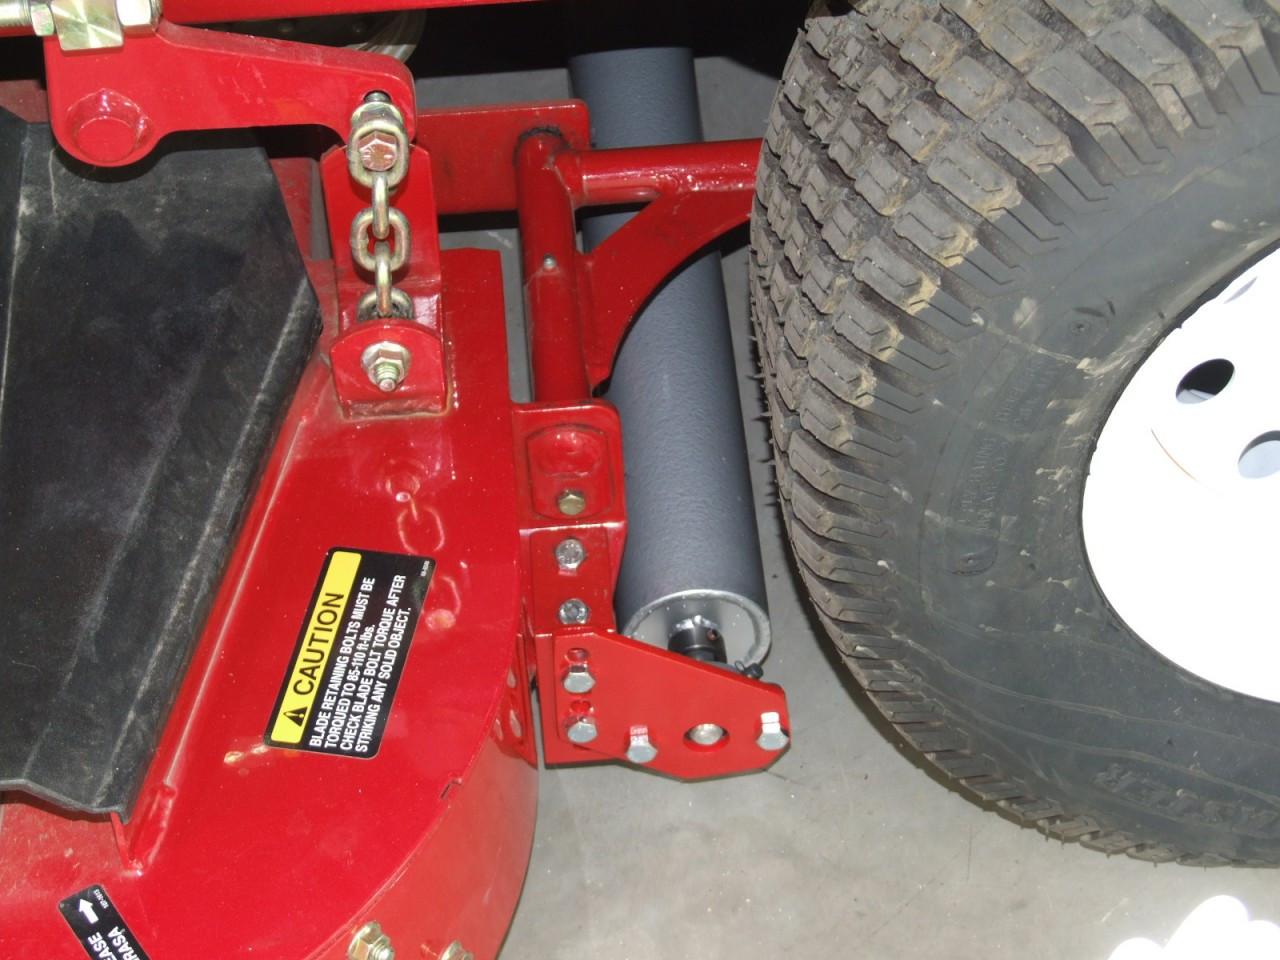 Installed lawn striper kit on Toro 400 Series Commercial mower.